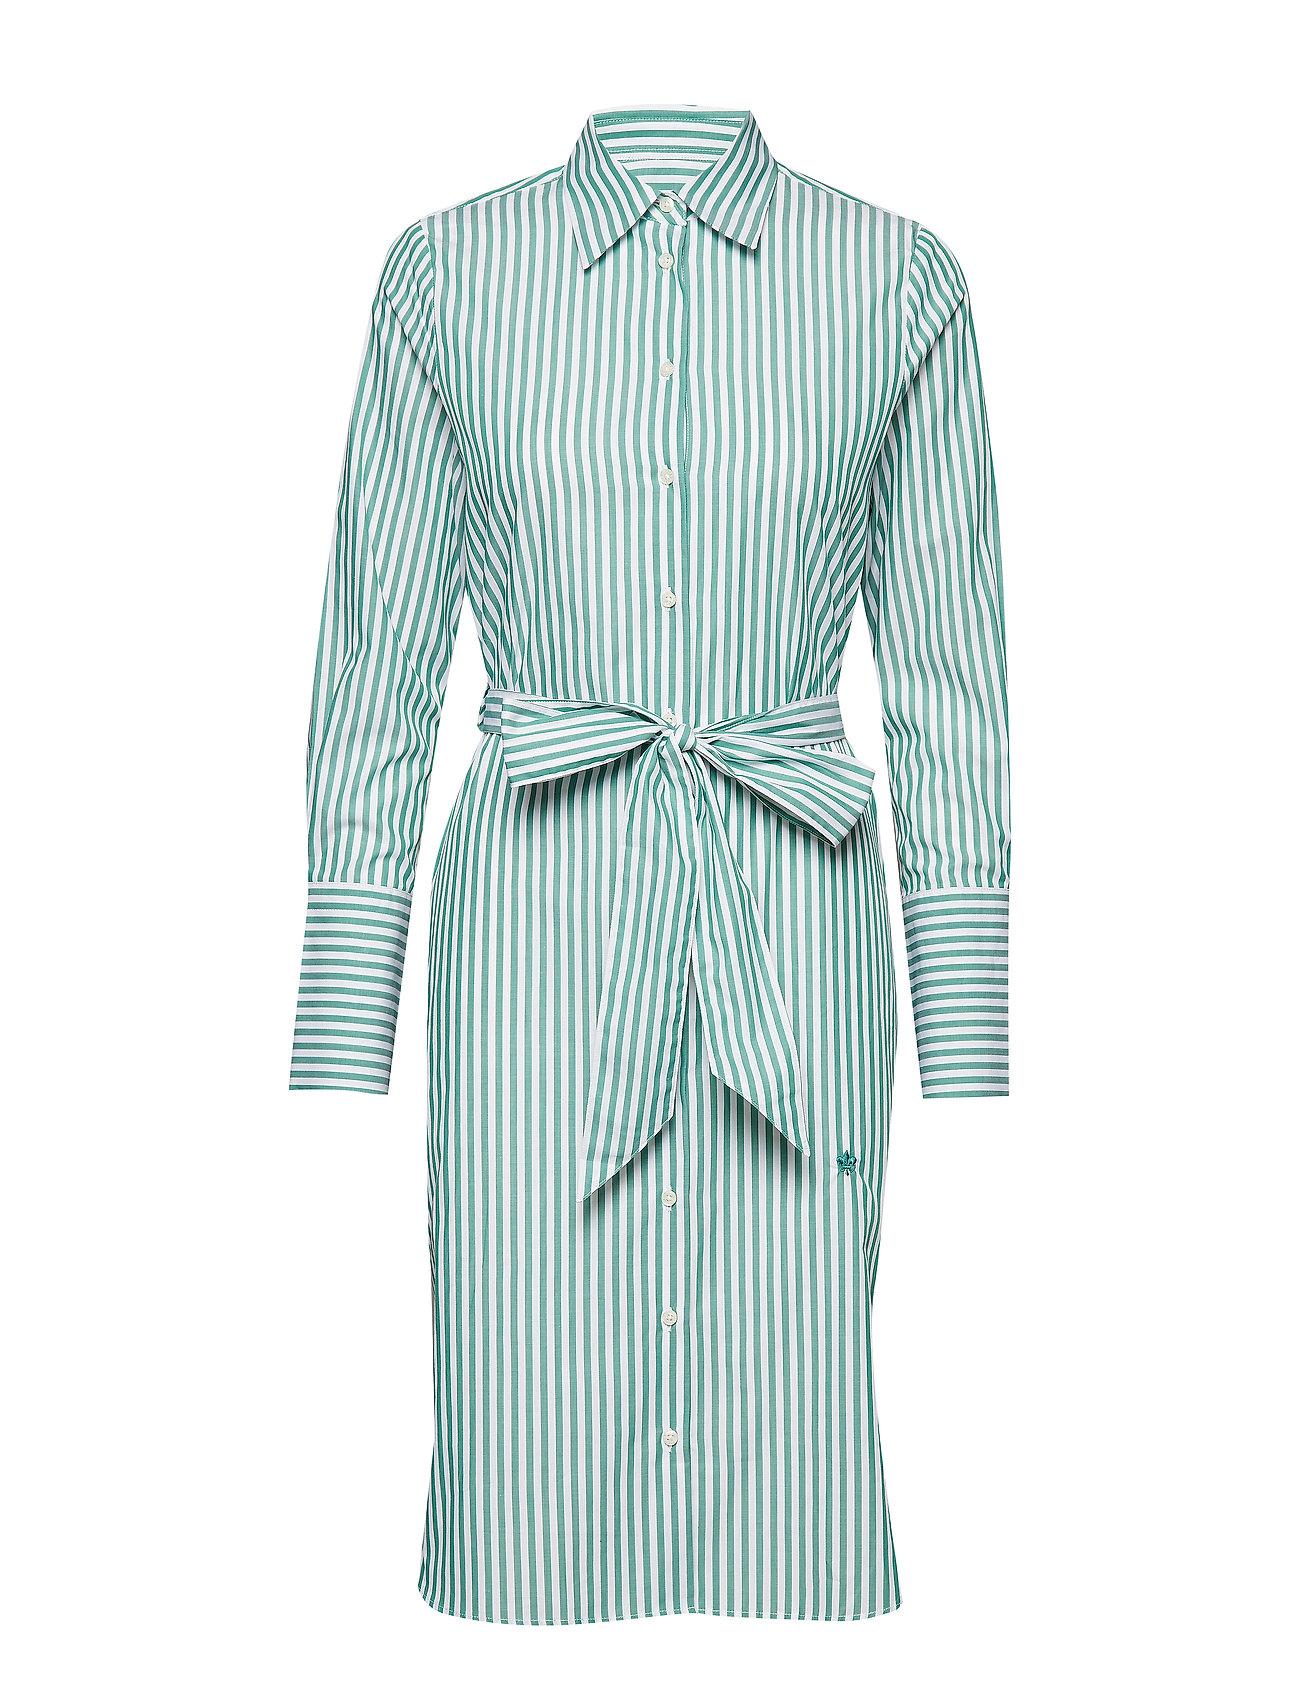 Striped Striped Lady DressgreenMorris Chiara Shirt Chiara Shirt DressgreenMorris Shirt DressgreenMorris Chiara Lady Striped VpMSUz